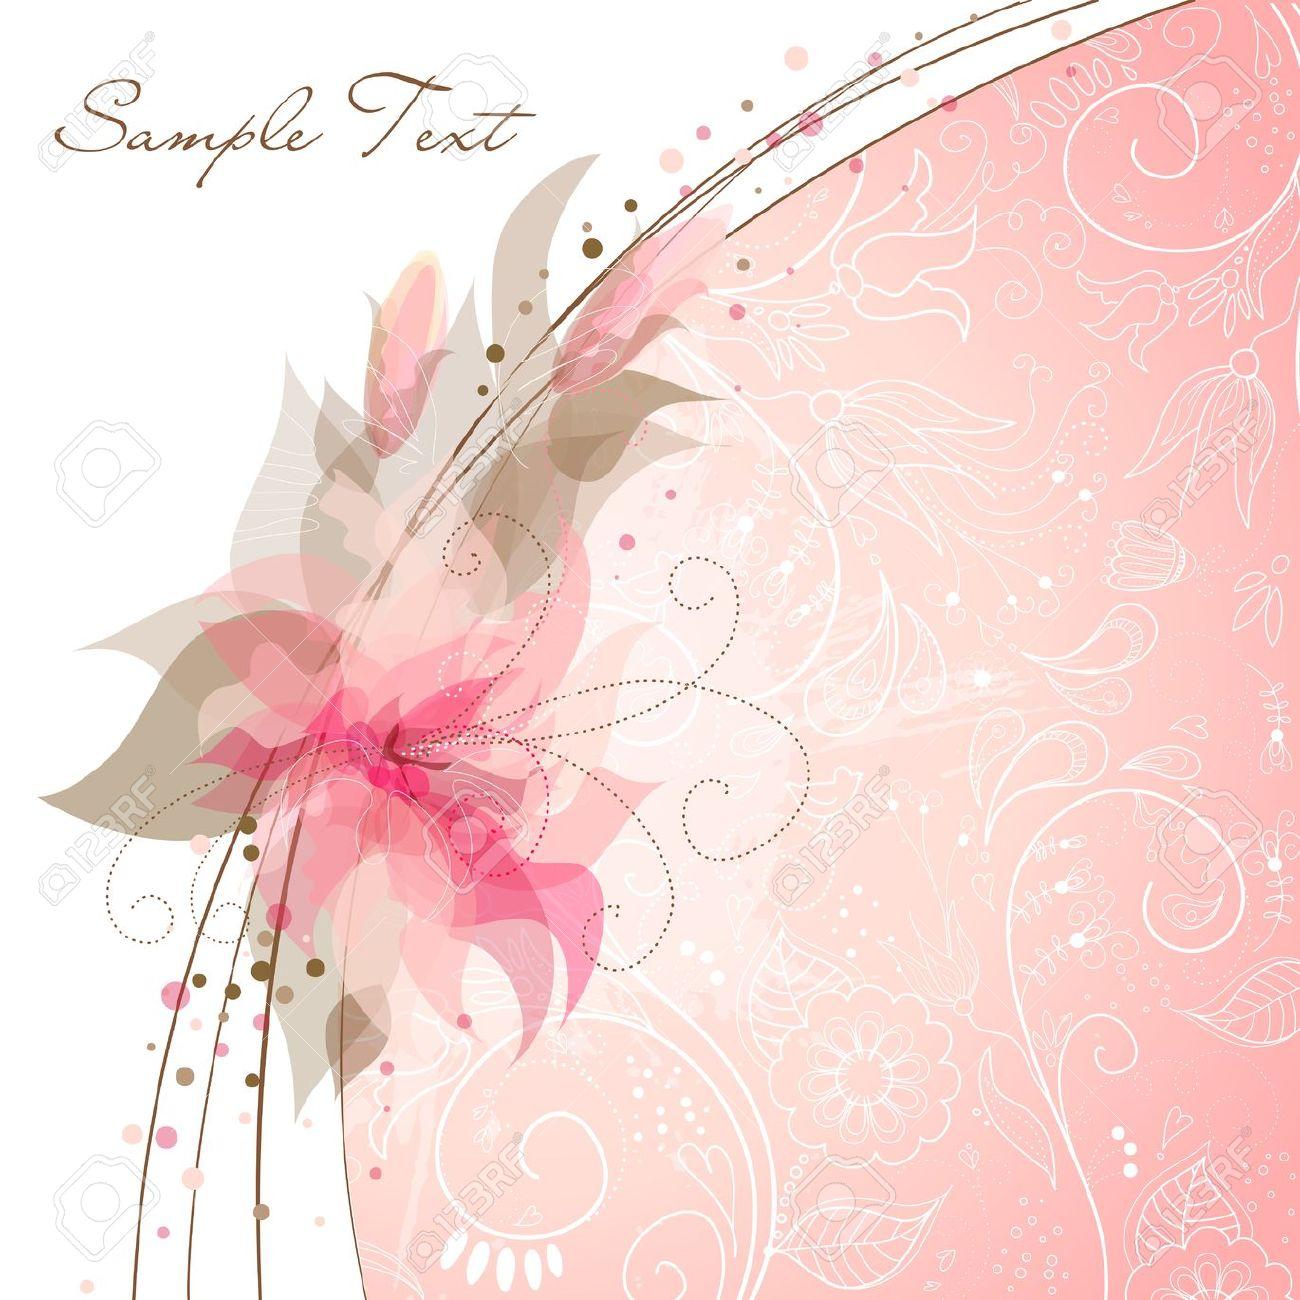 Free Download Wedding Invitation Pink Background Designs